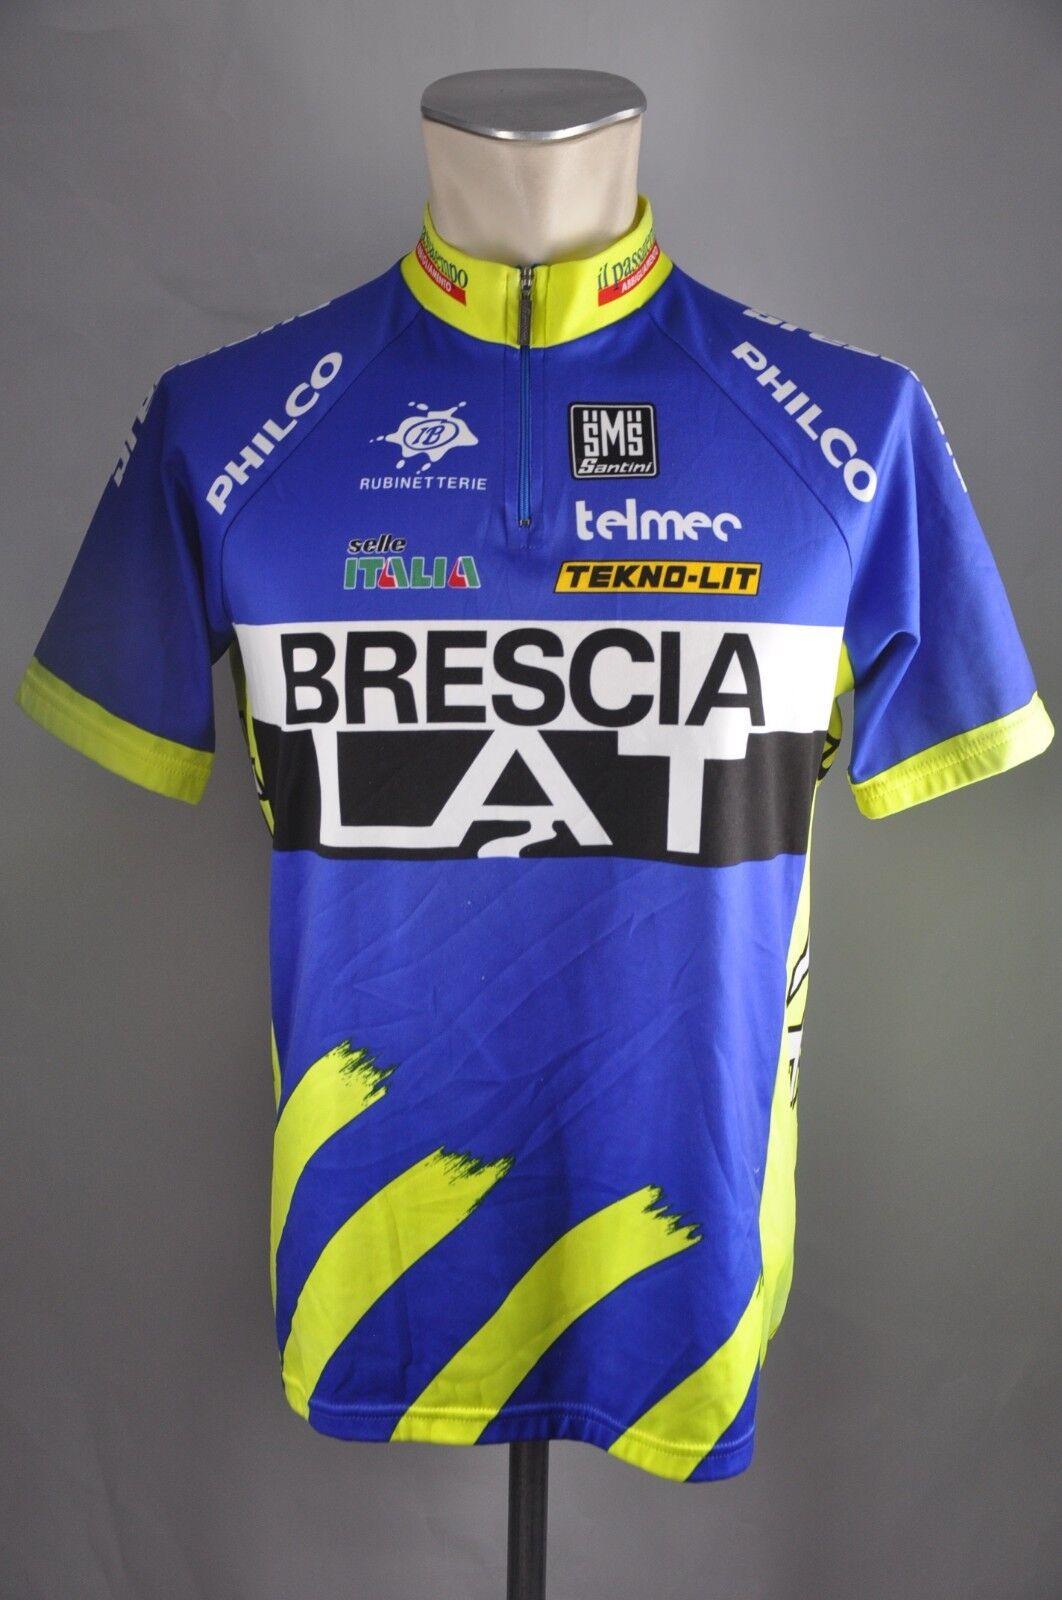 Santini Team Brescia LAT Trikot Gr. XL  BW 56cm cycling jersey Fahrrad KE5